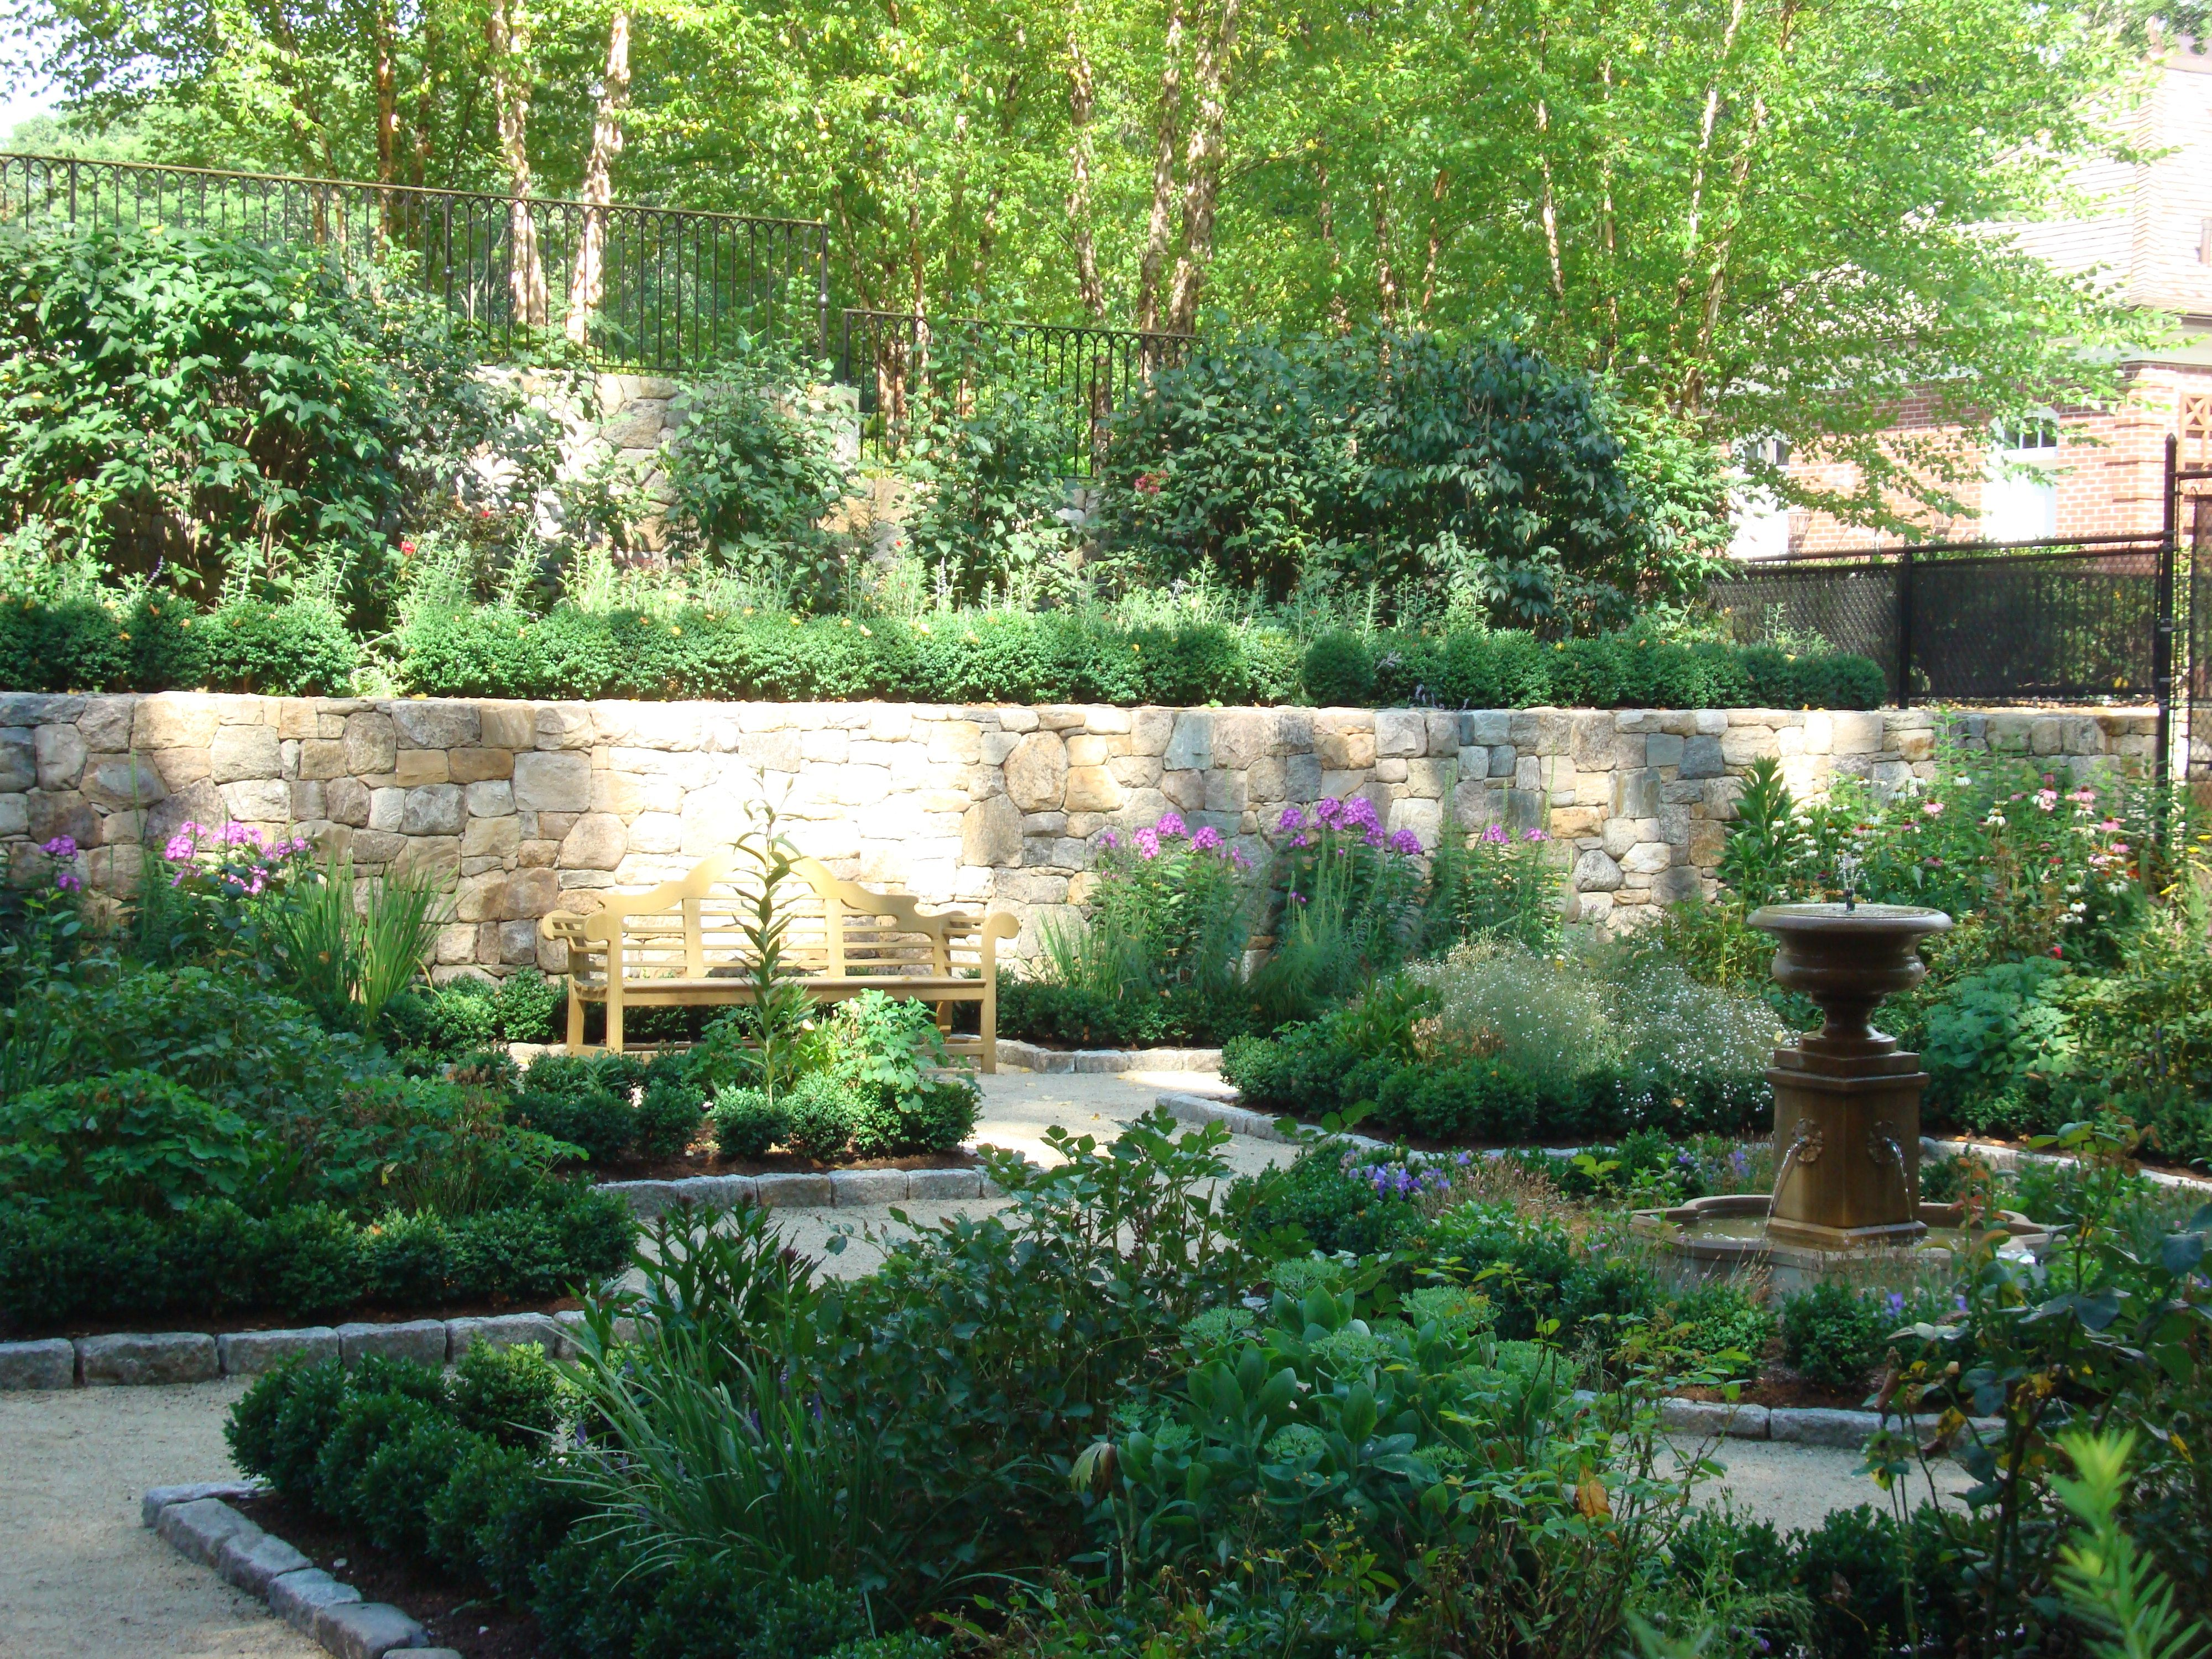 Garden Fountain, Stone Wall, Residential Landscape Design, Commercial  Landscape Design: Http://wesleystout.com/